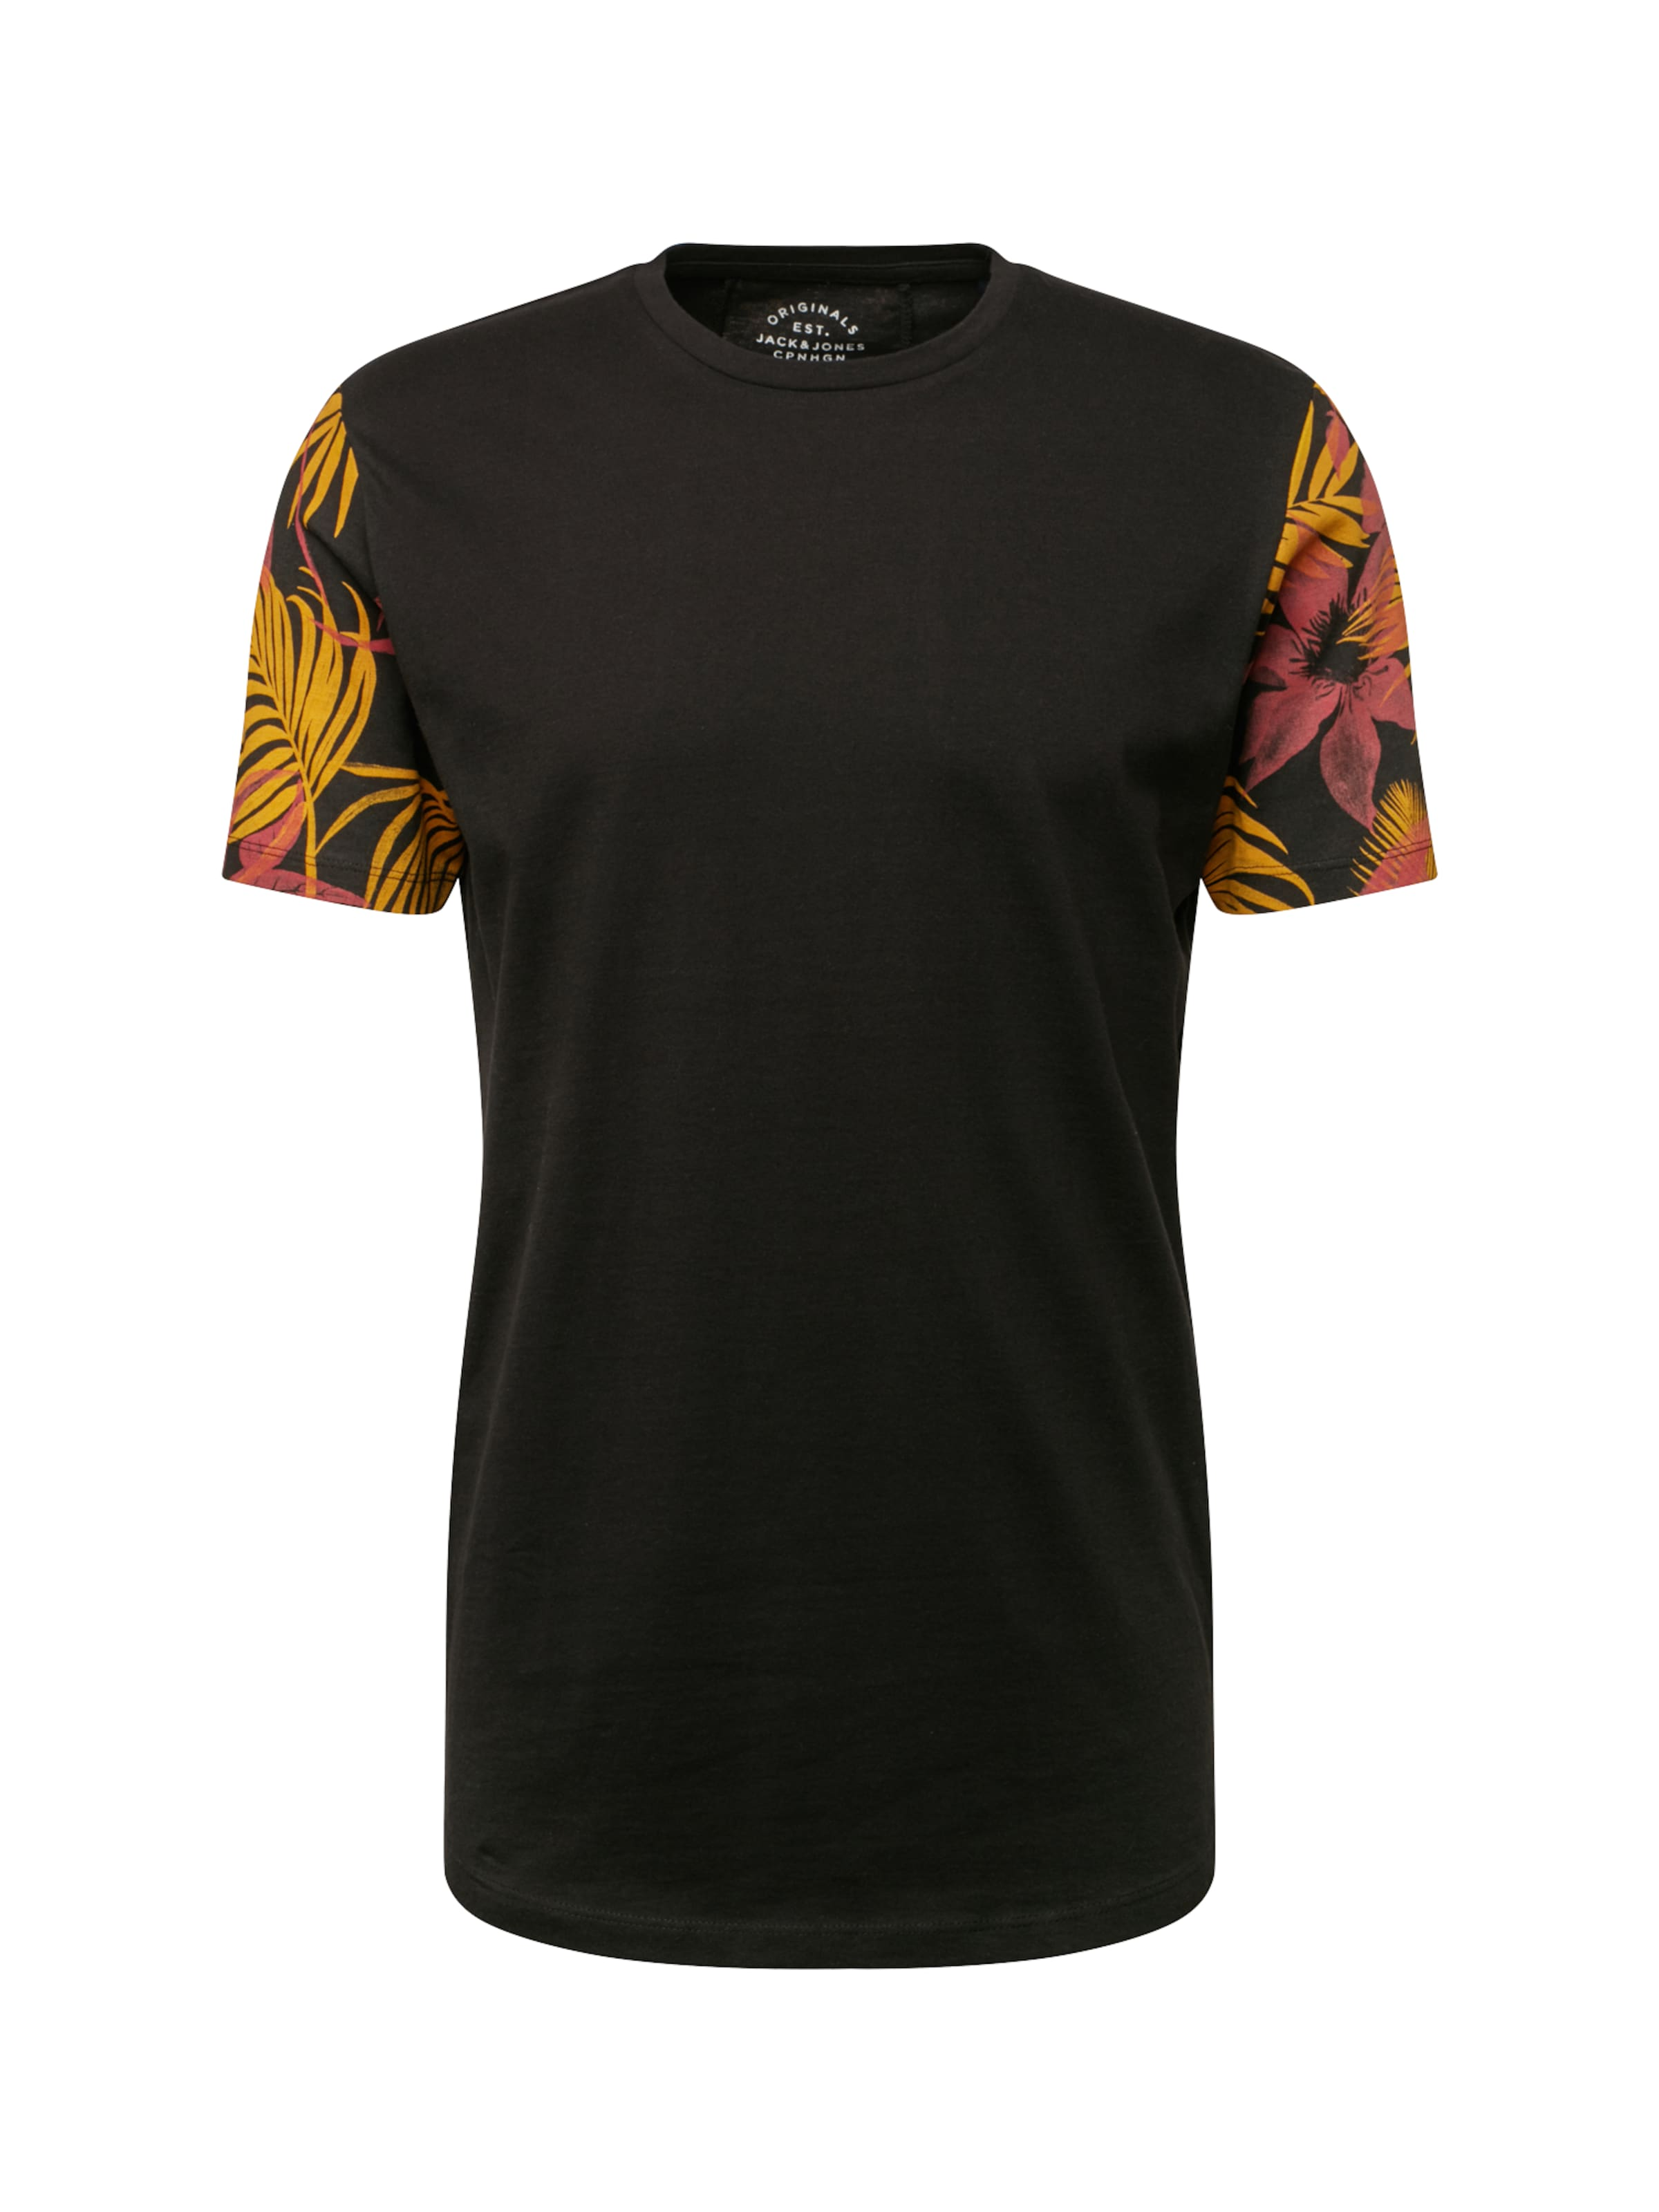 Ss En Jackamp; shirt T Noir 'jorgan Neck' Jones Tee Crew CthdsQr